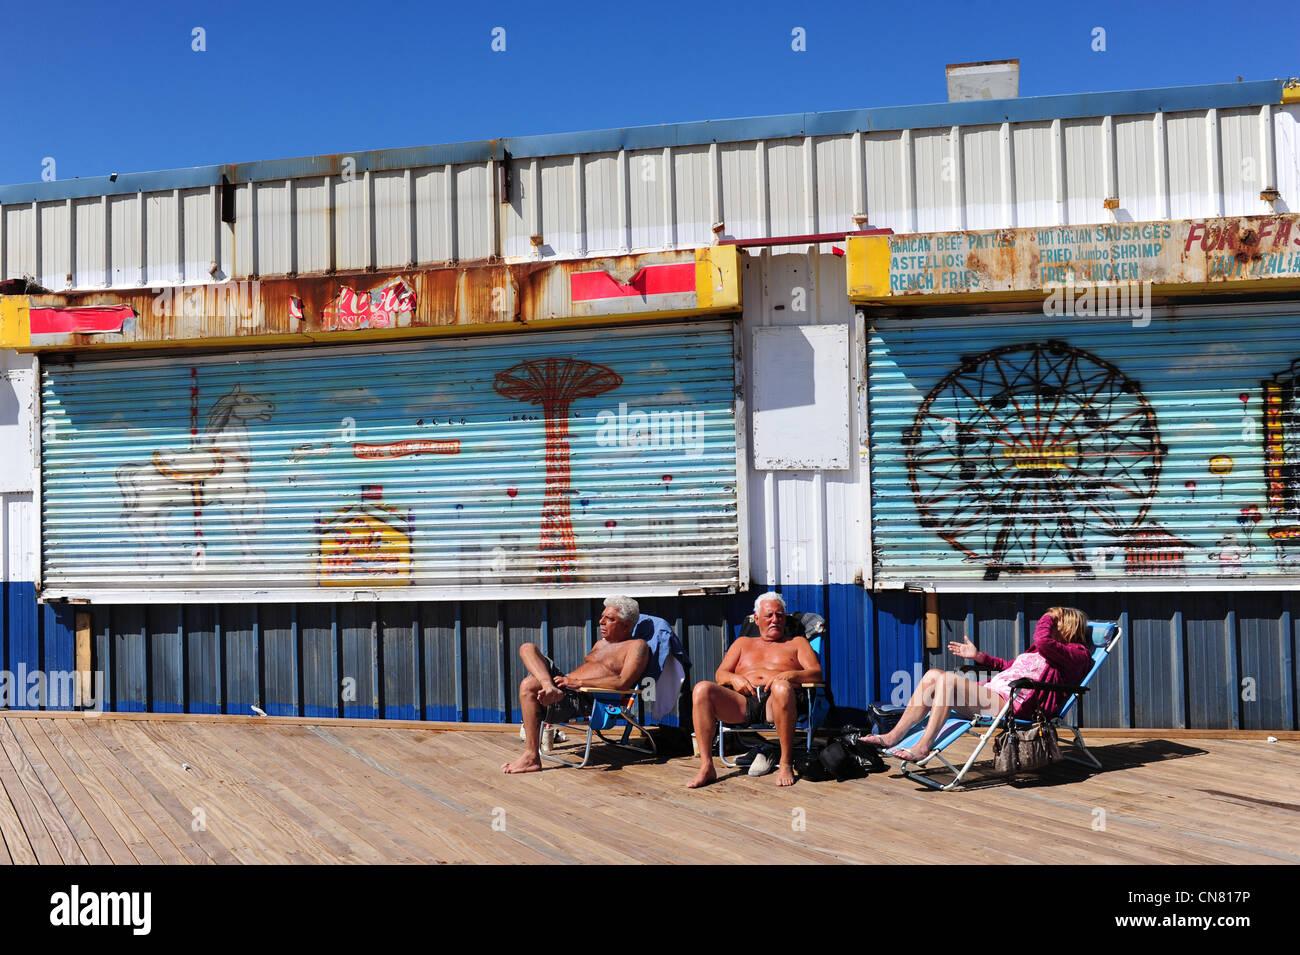 USA  New York City Brooklyn NY NYC Coney Island amusement park - three 3 older people sunbathe on the boardwalk Stock Photo